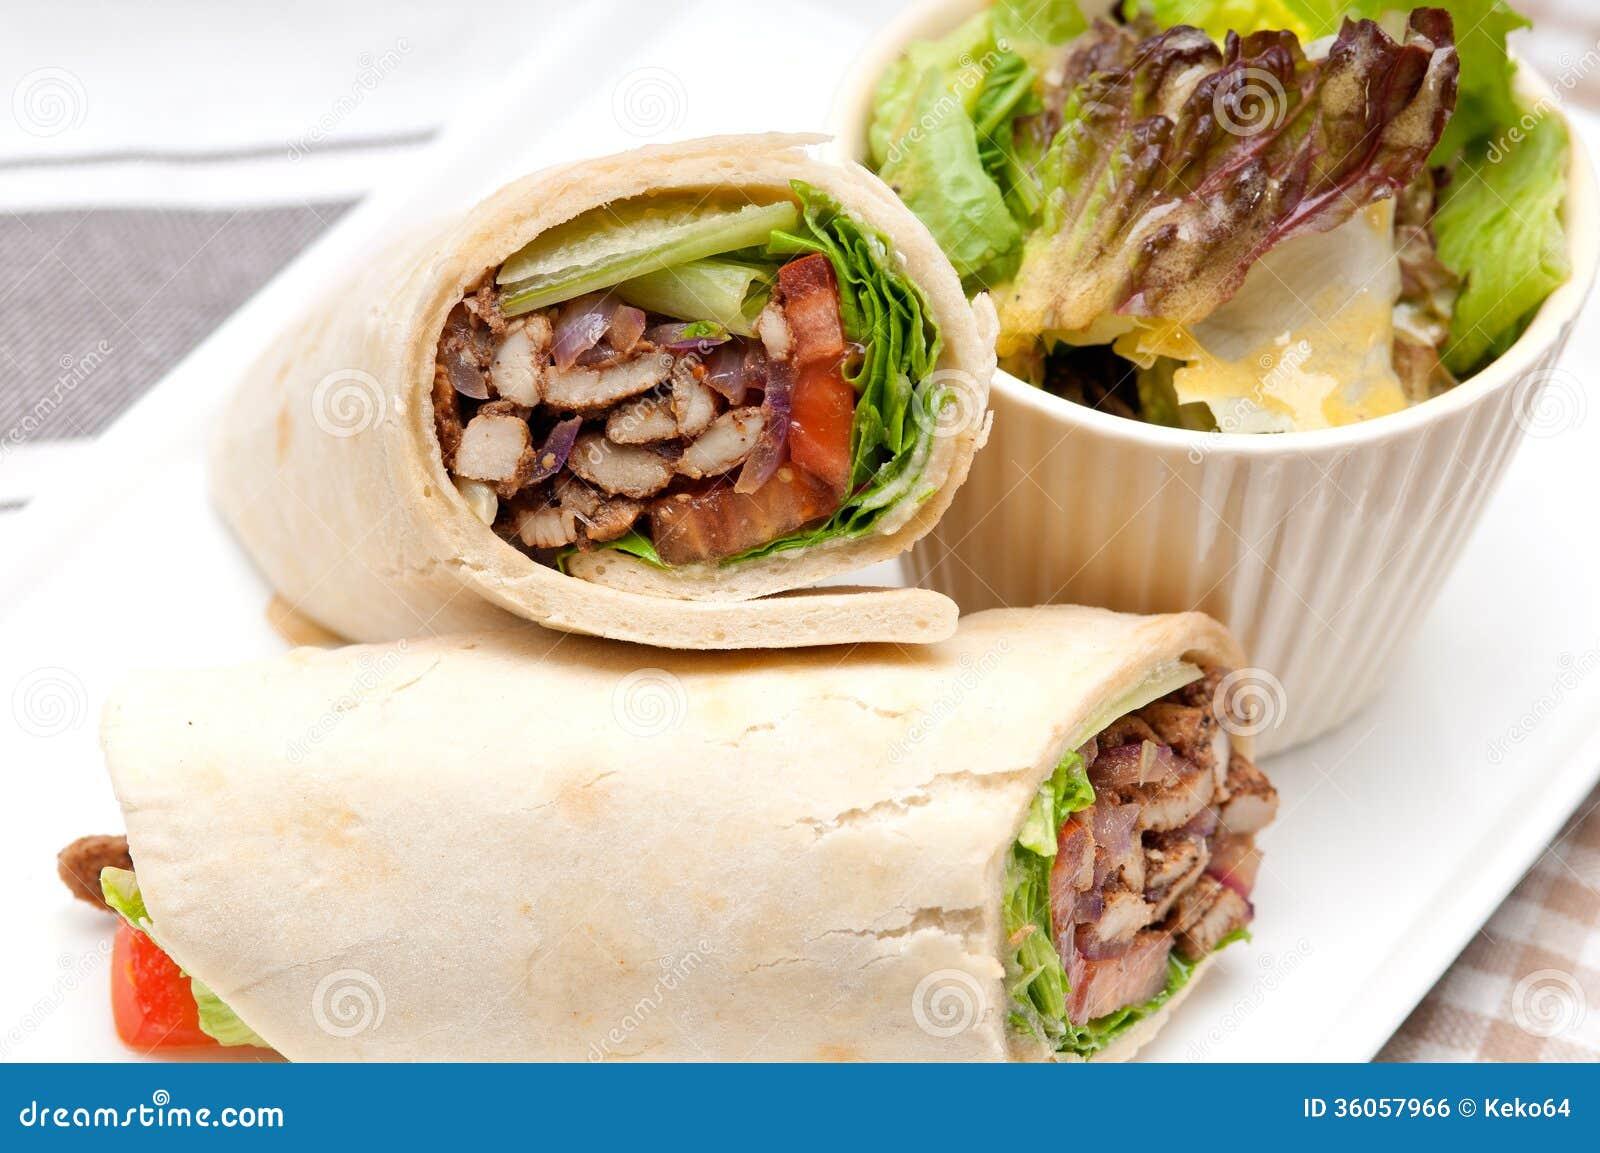 kafta shawarma chicken pita wrap roll sandwich stock photo image 36057966. Black Bedroom Furniture Sets. Home Design Ideas